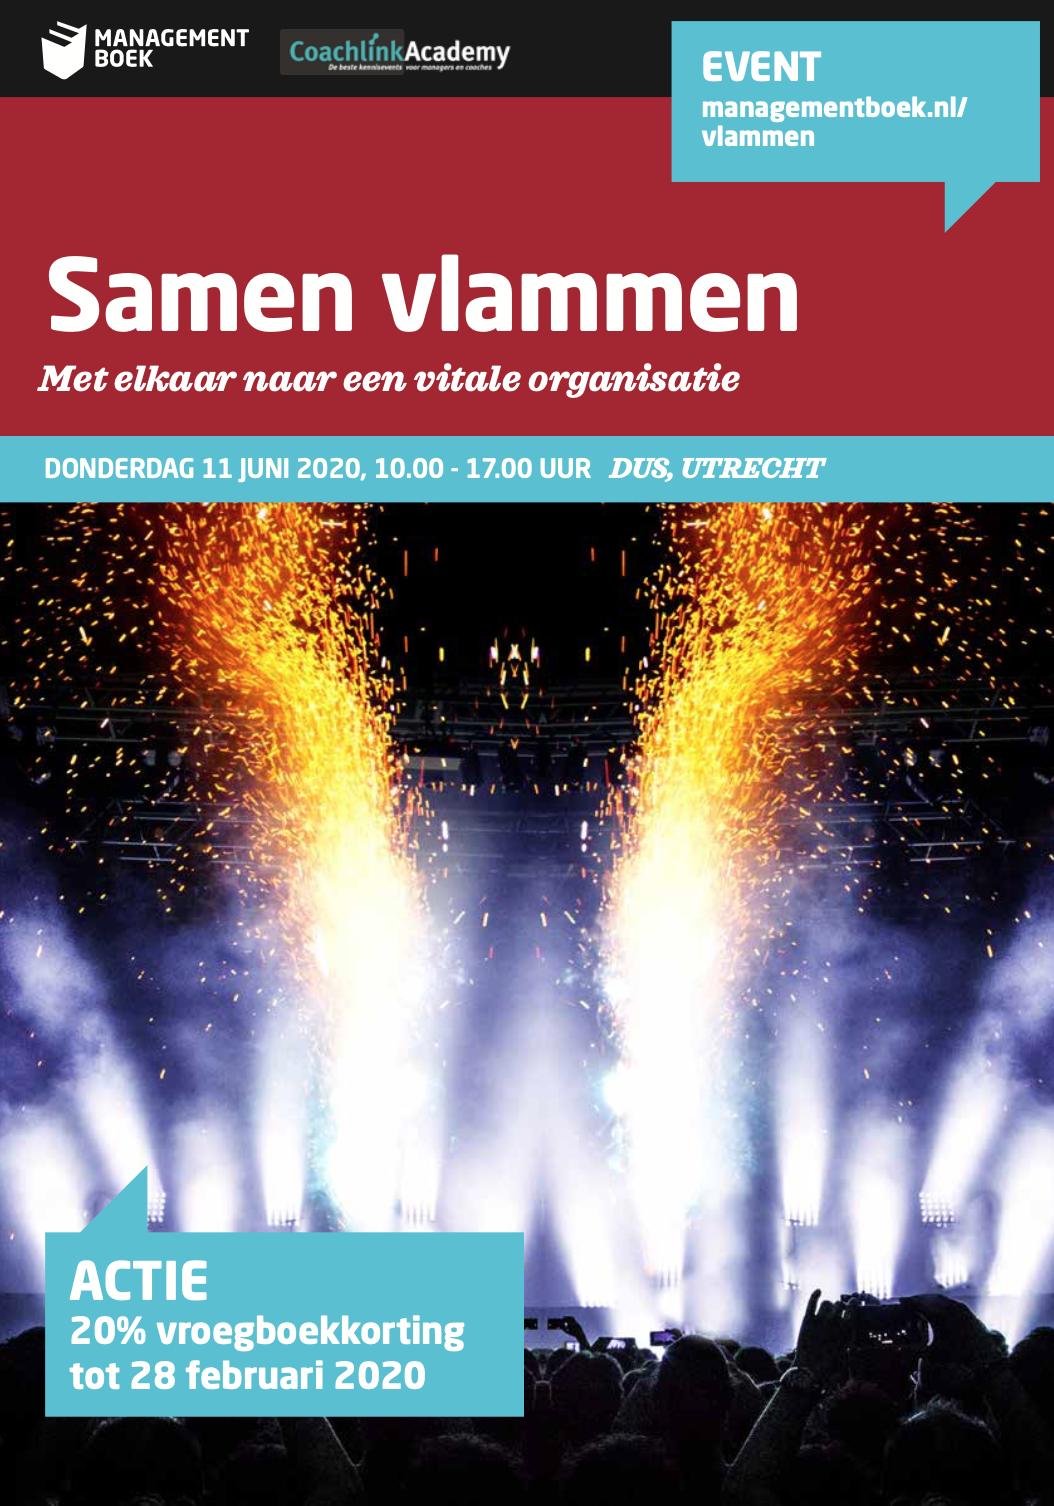 Samen vlammen event 2020, event met Elke Geraerts, Marijke Lingsma e.a.